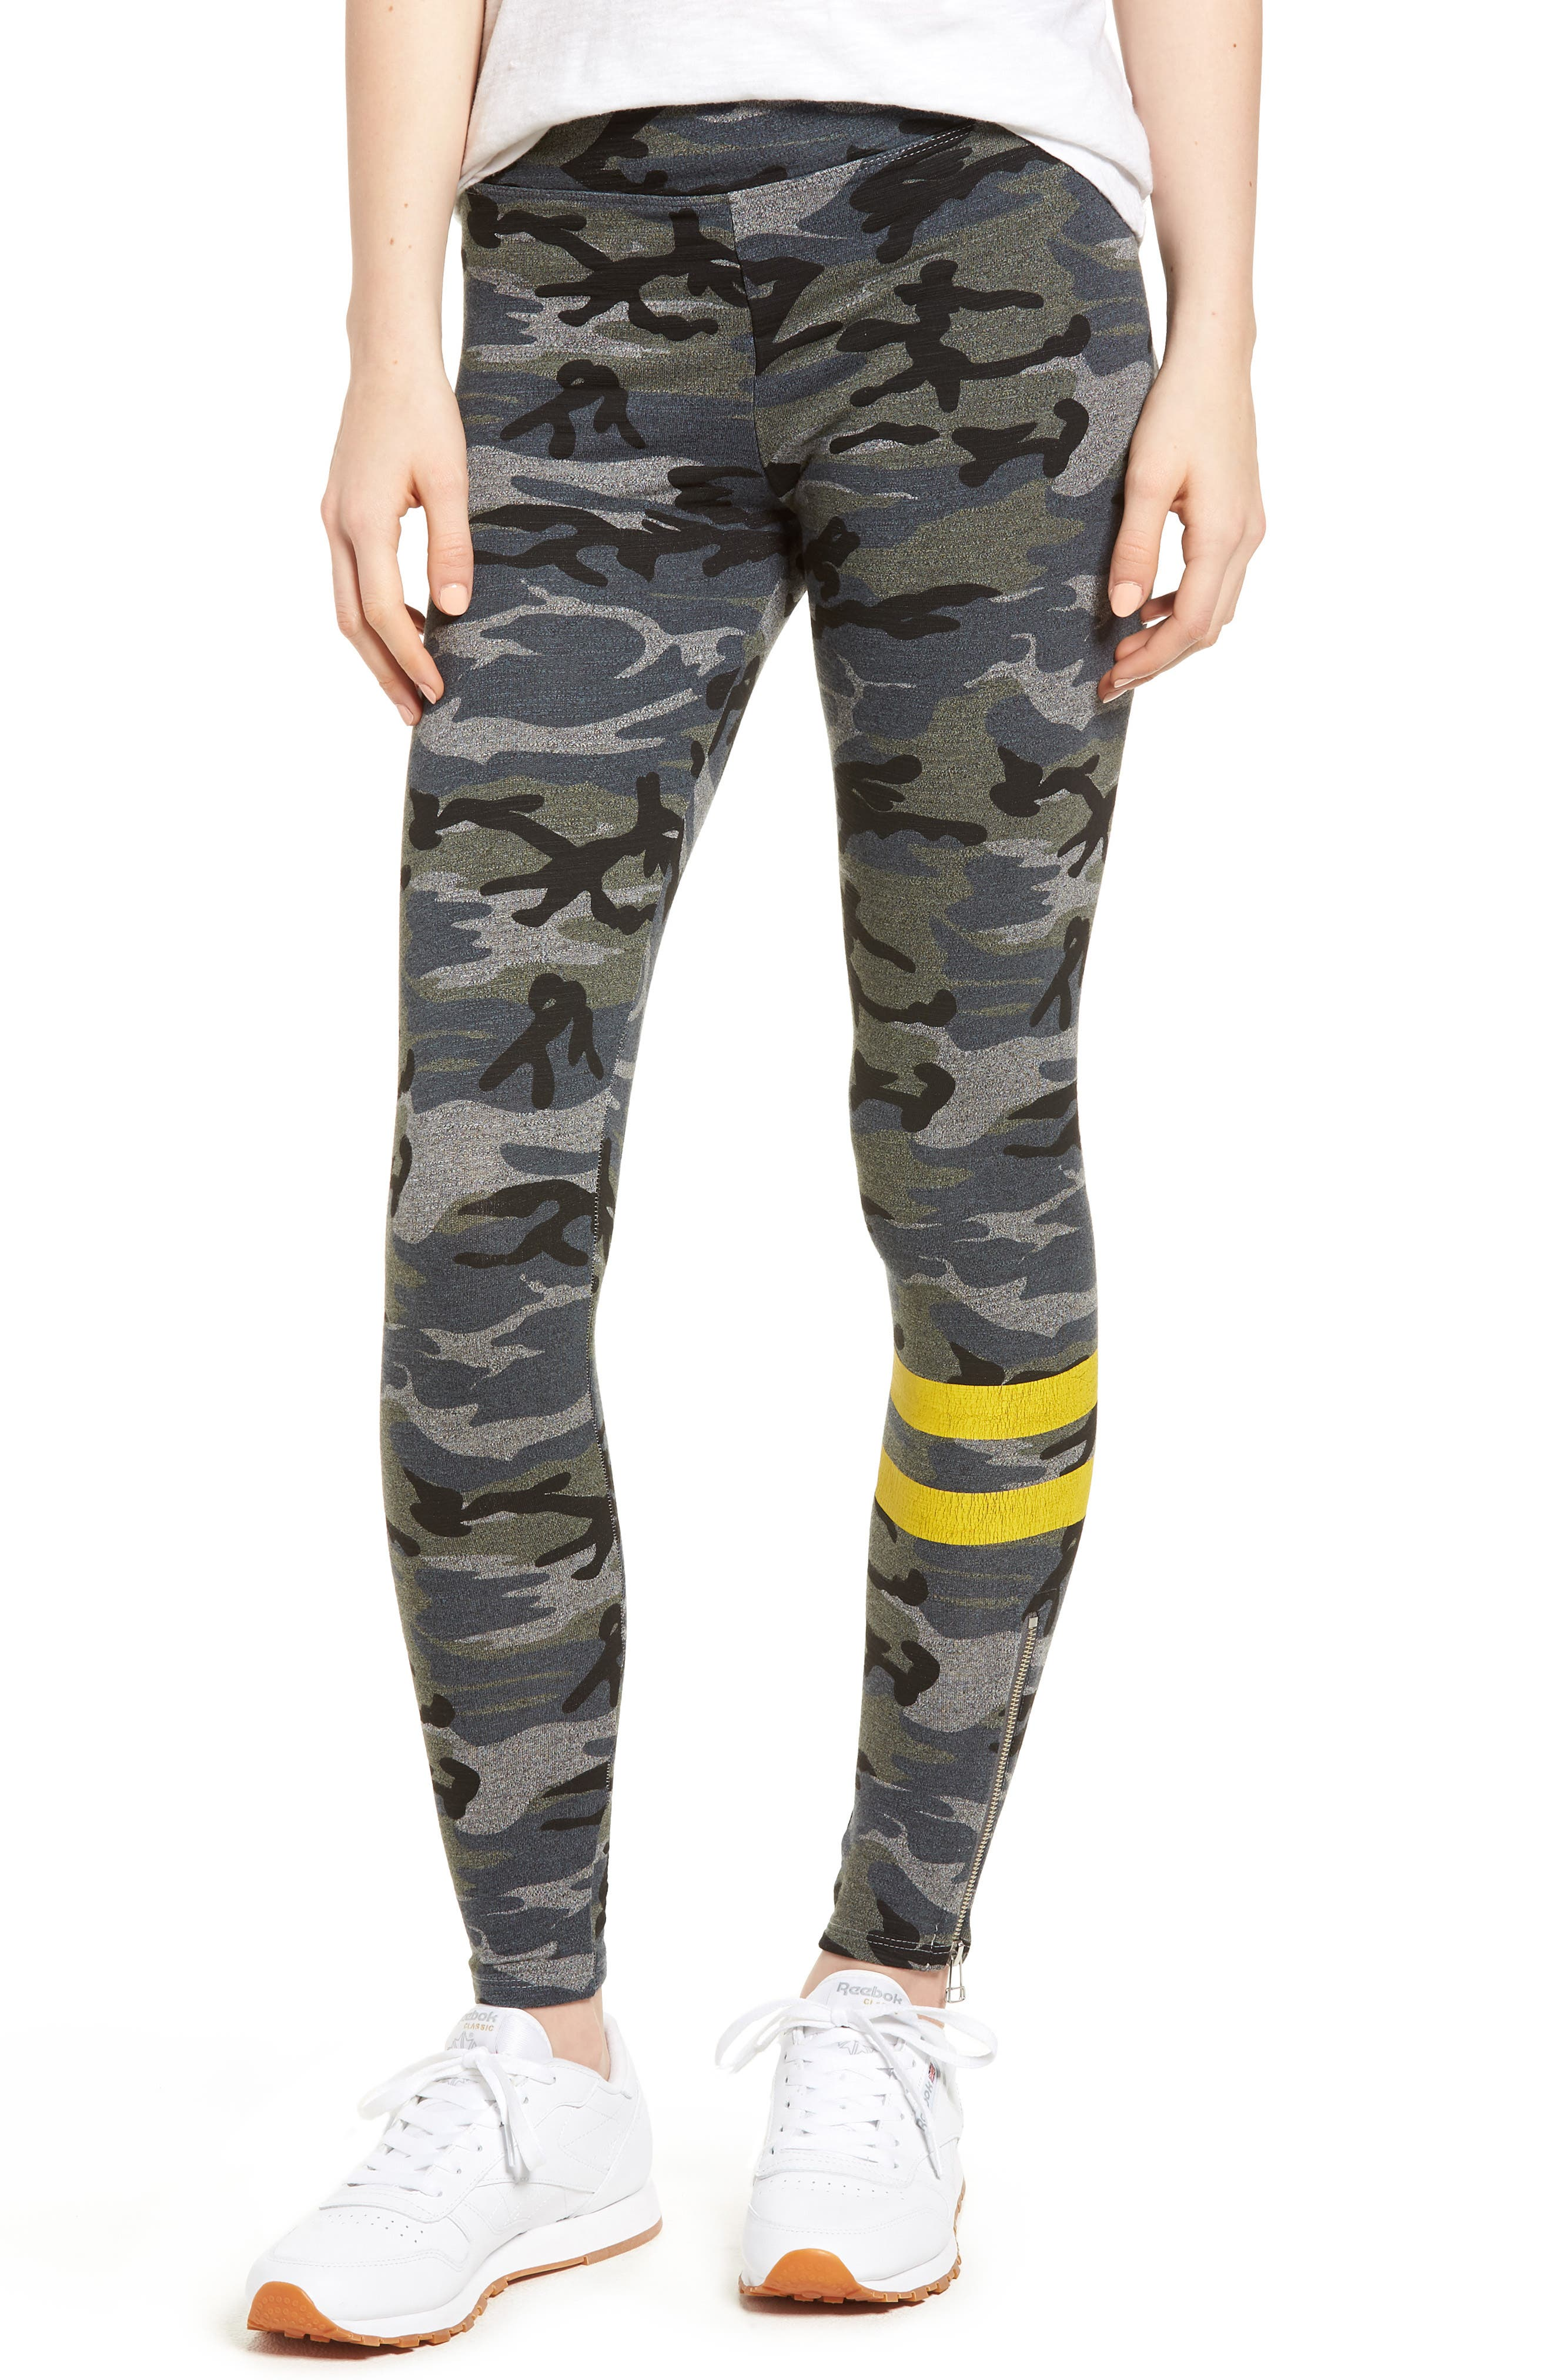 Stripe Camo Yoga Pants,                         Main,                         color, 020